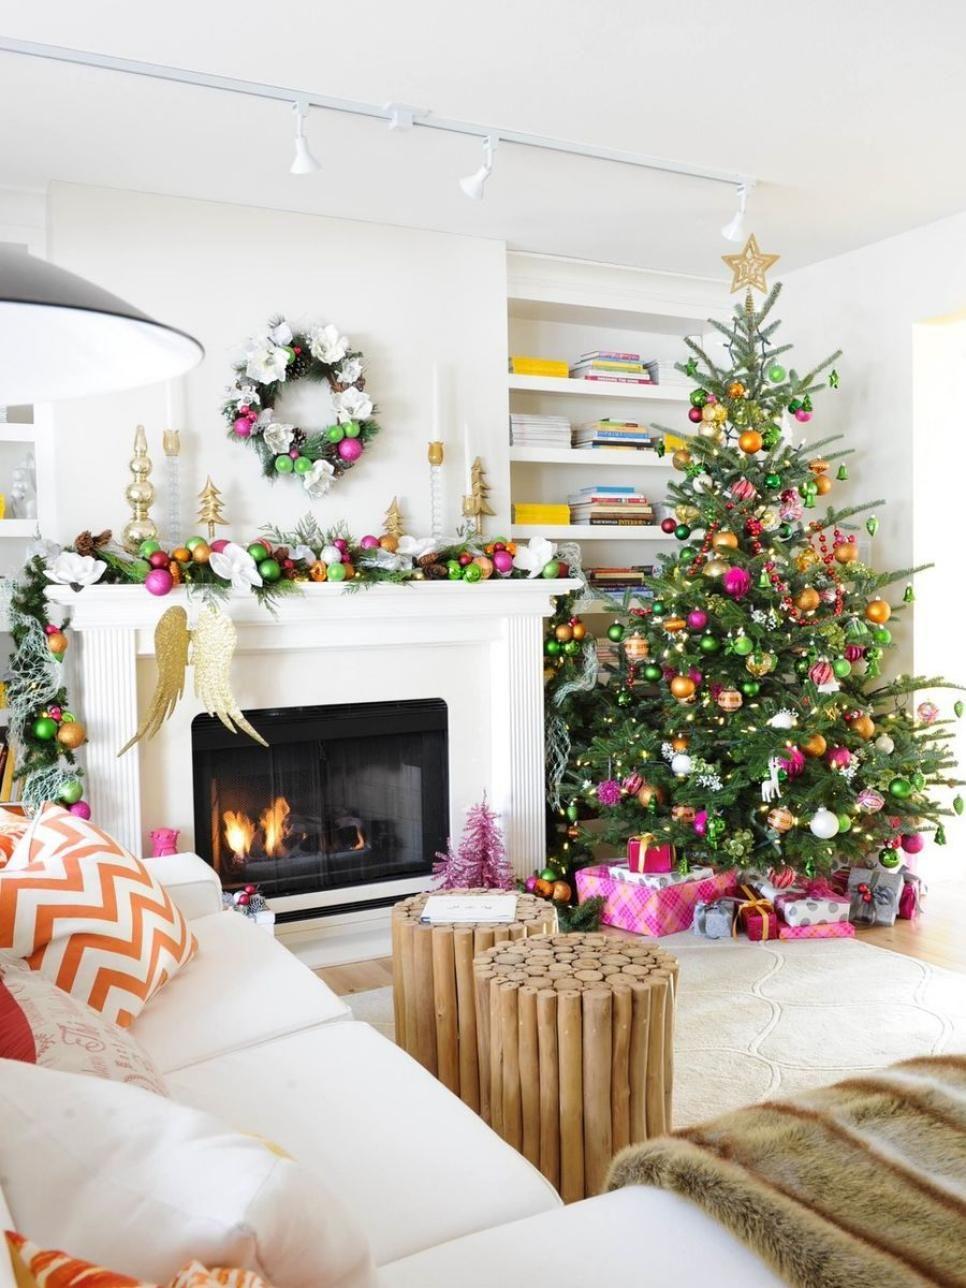 65 Christmas Tree Decorating Ideas Hgtv Cool Christmas Trees